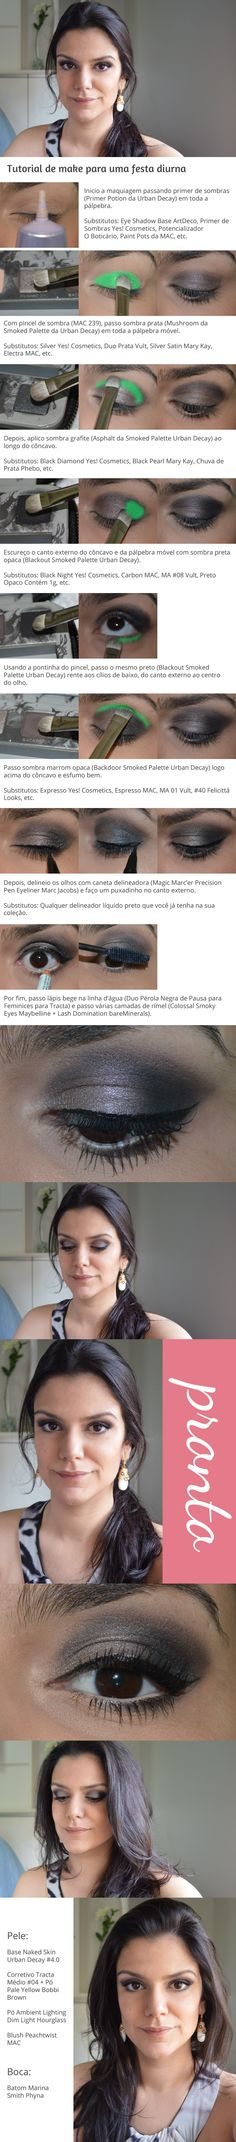 Tutorial: Make para festa diurna http://www.2beauty.com.br/blog/2014/07/18/tutorial-make-para-festa-diurna/ #tutorial #maquiagem